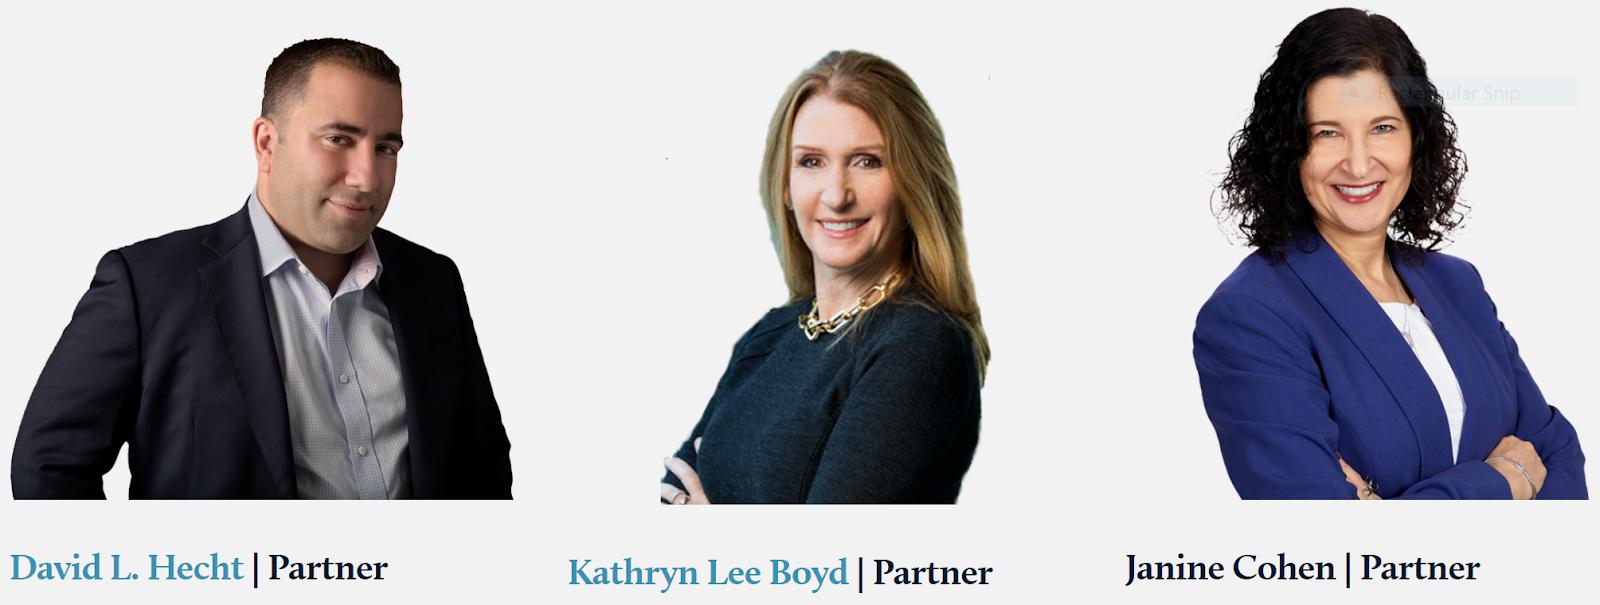 The $1 Billion Case & The Unfolding Litigation Funding & Legal Drama 10